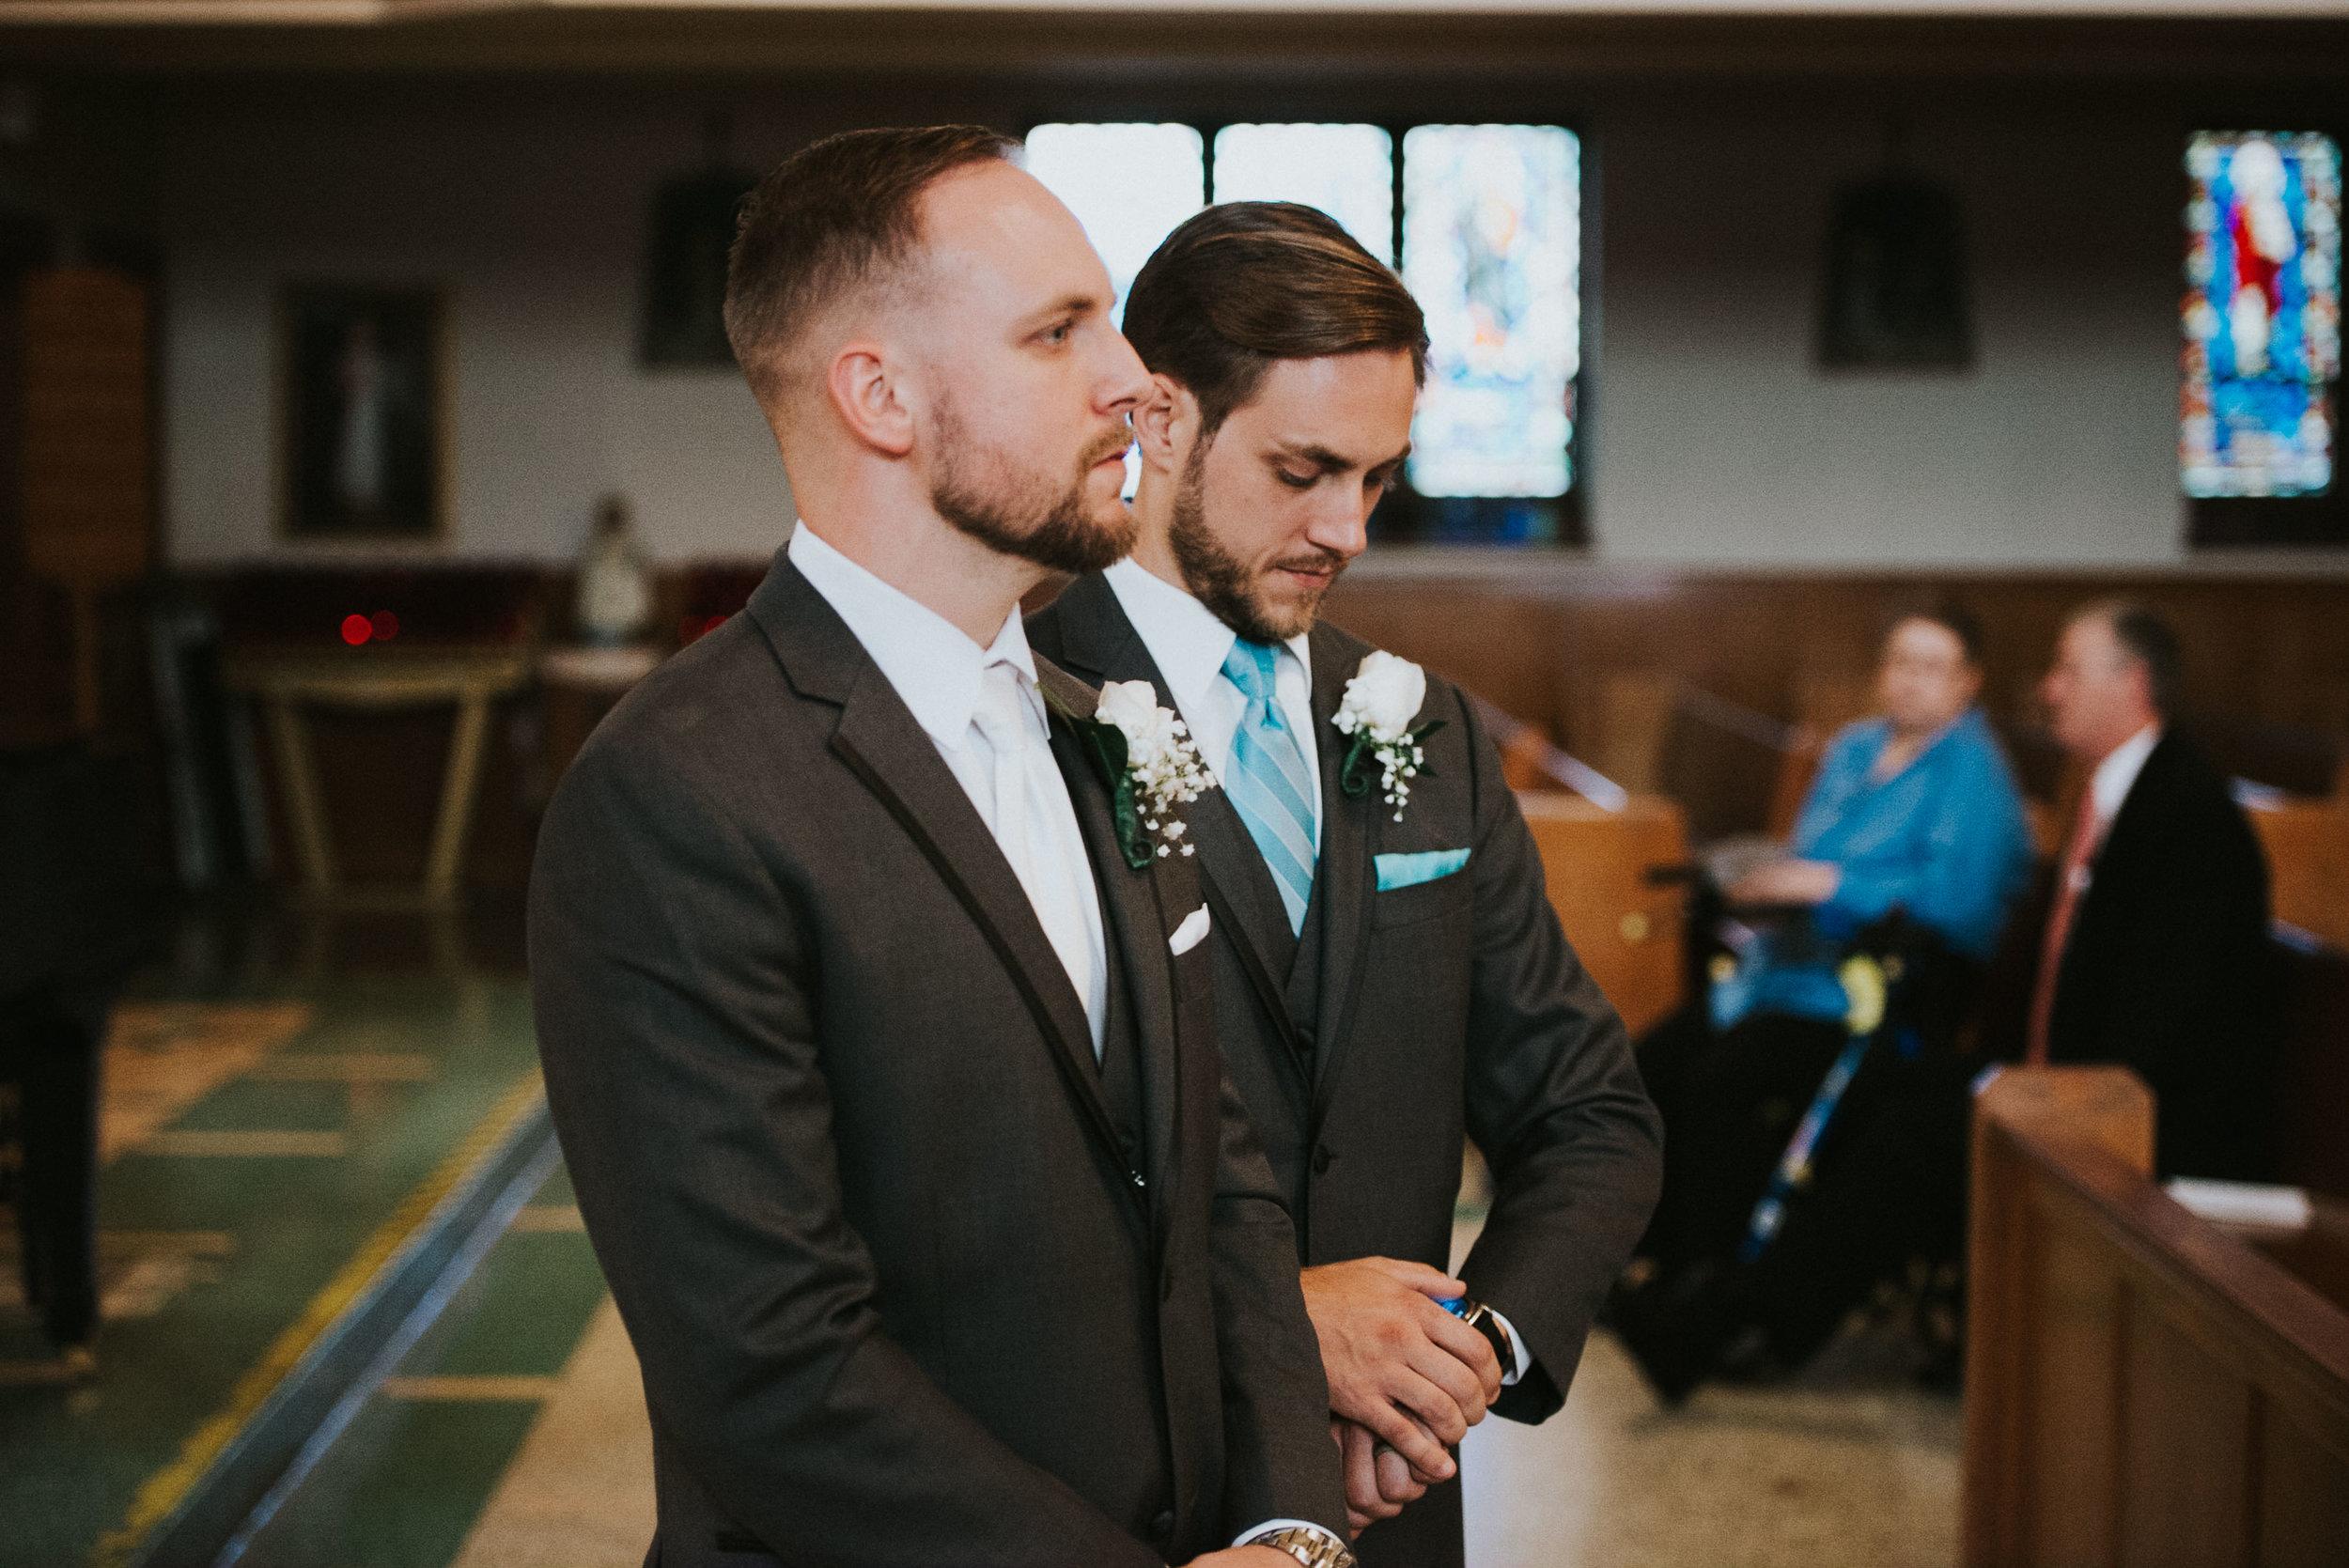 Tiana-and-Danny-Wedding-314.jpg